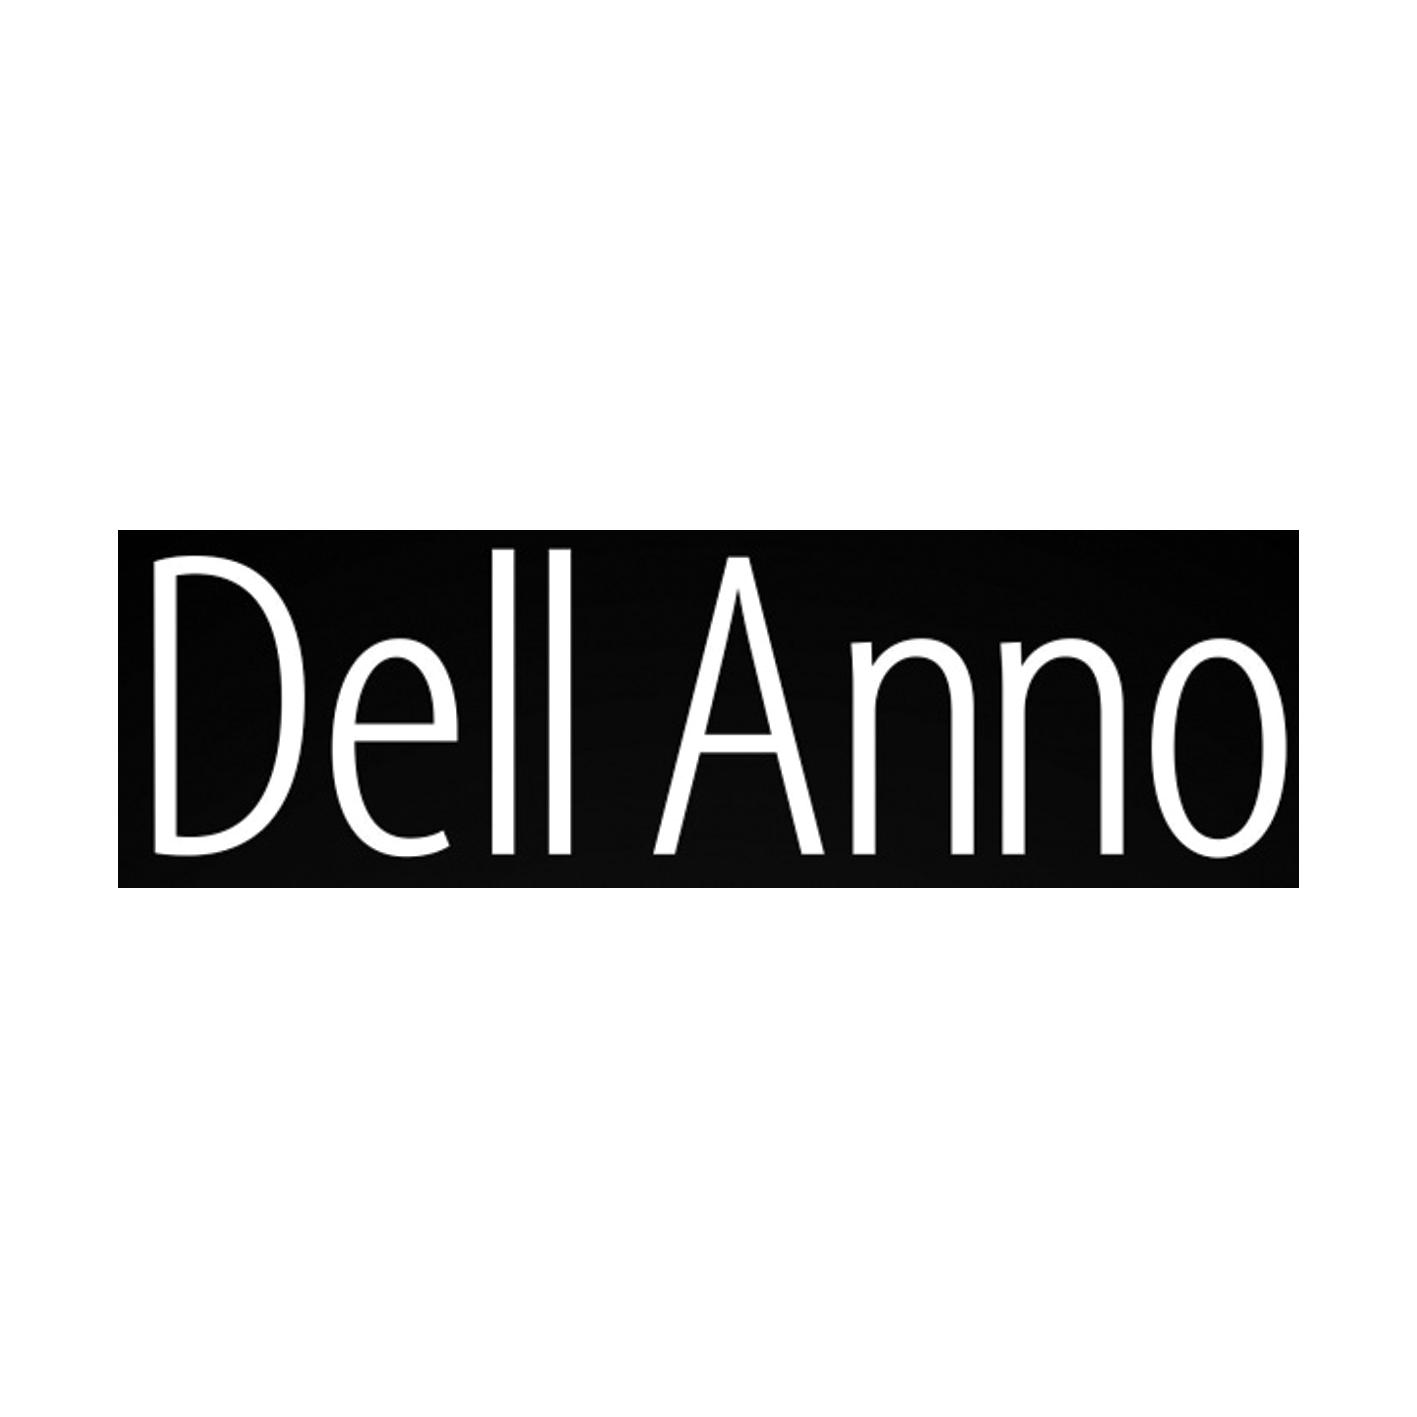 Pedro-Sabie-Dj-Clientes_0004_del-anno-2-logo.jpg.png